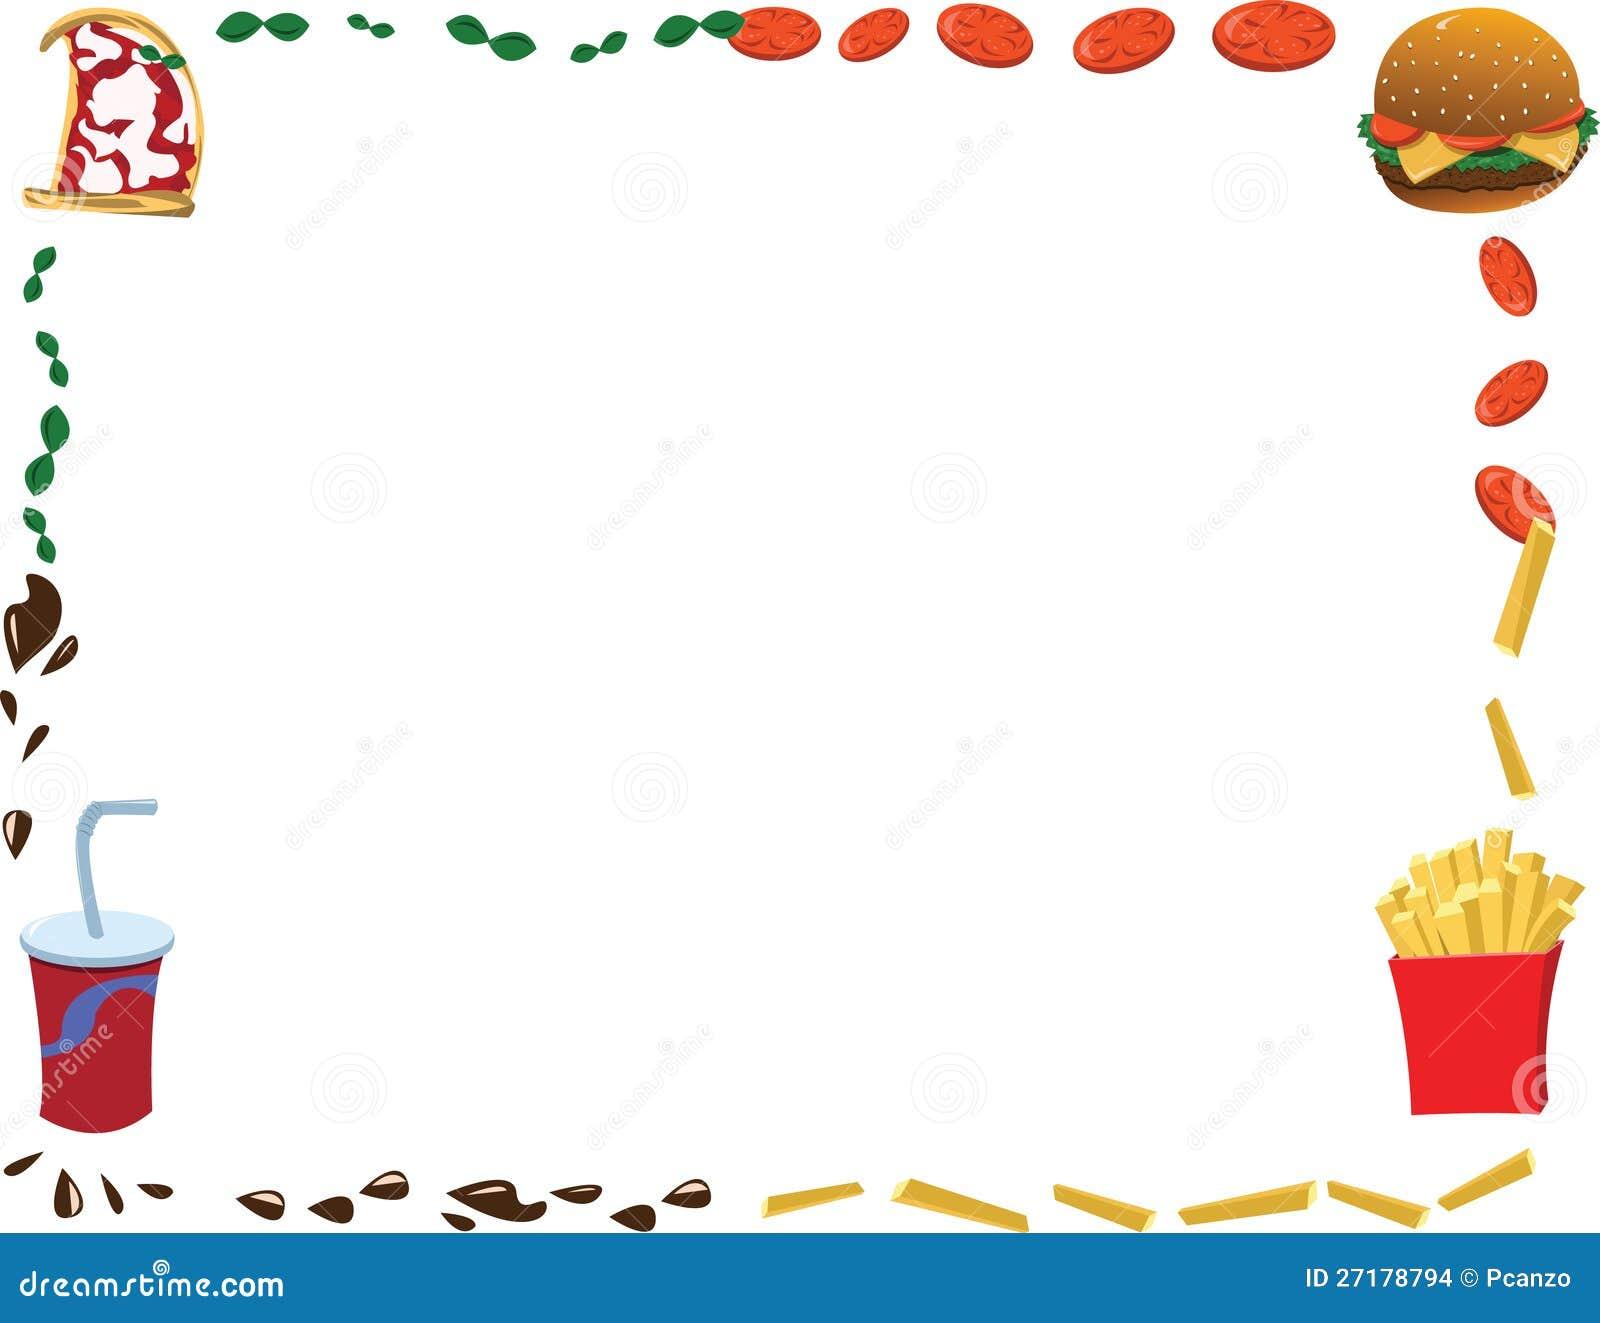 Southwest Kitchen Design Horizontal Menu Frame Stock Vector Illustration Of Fries